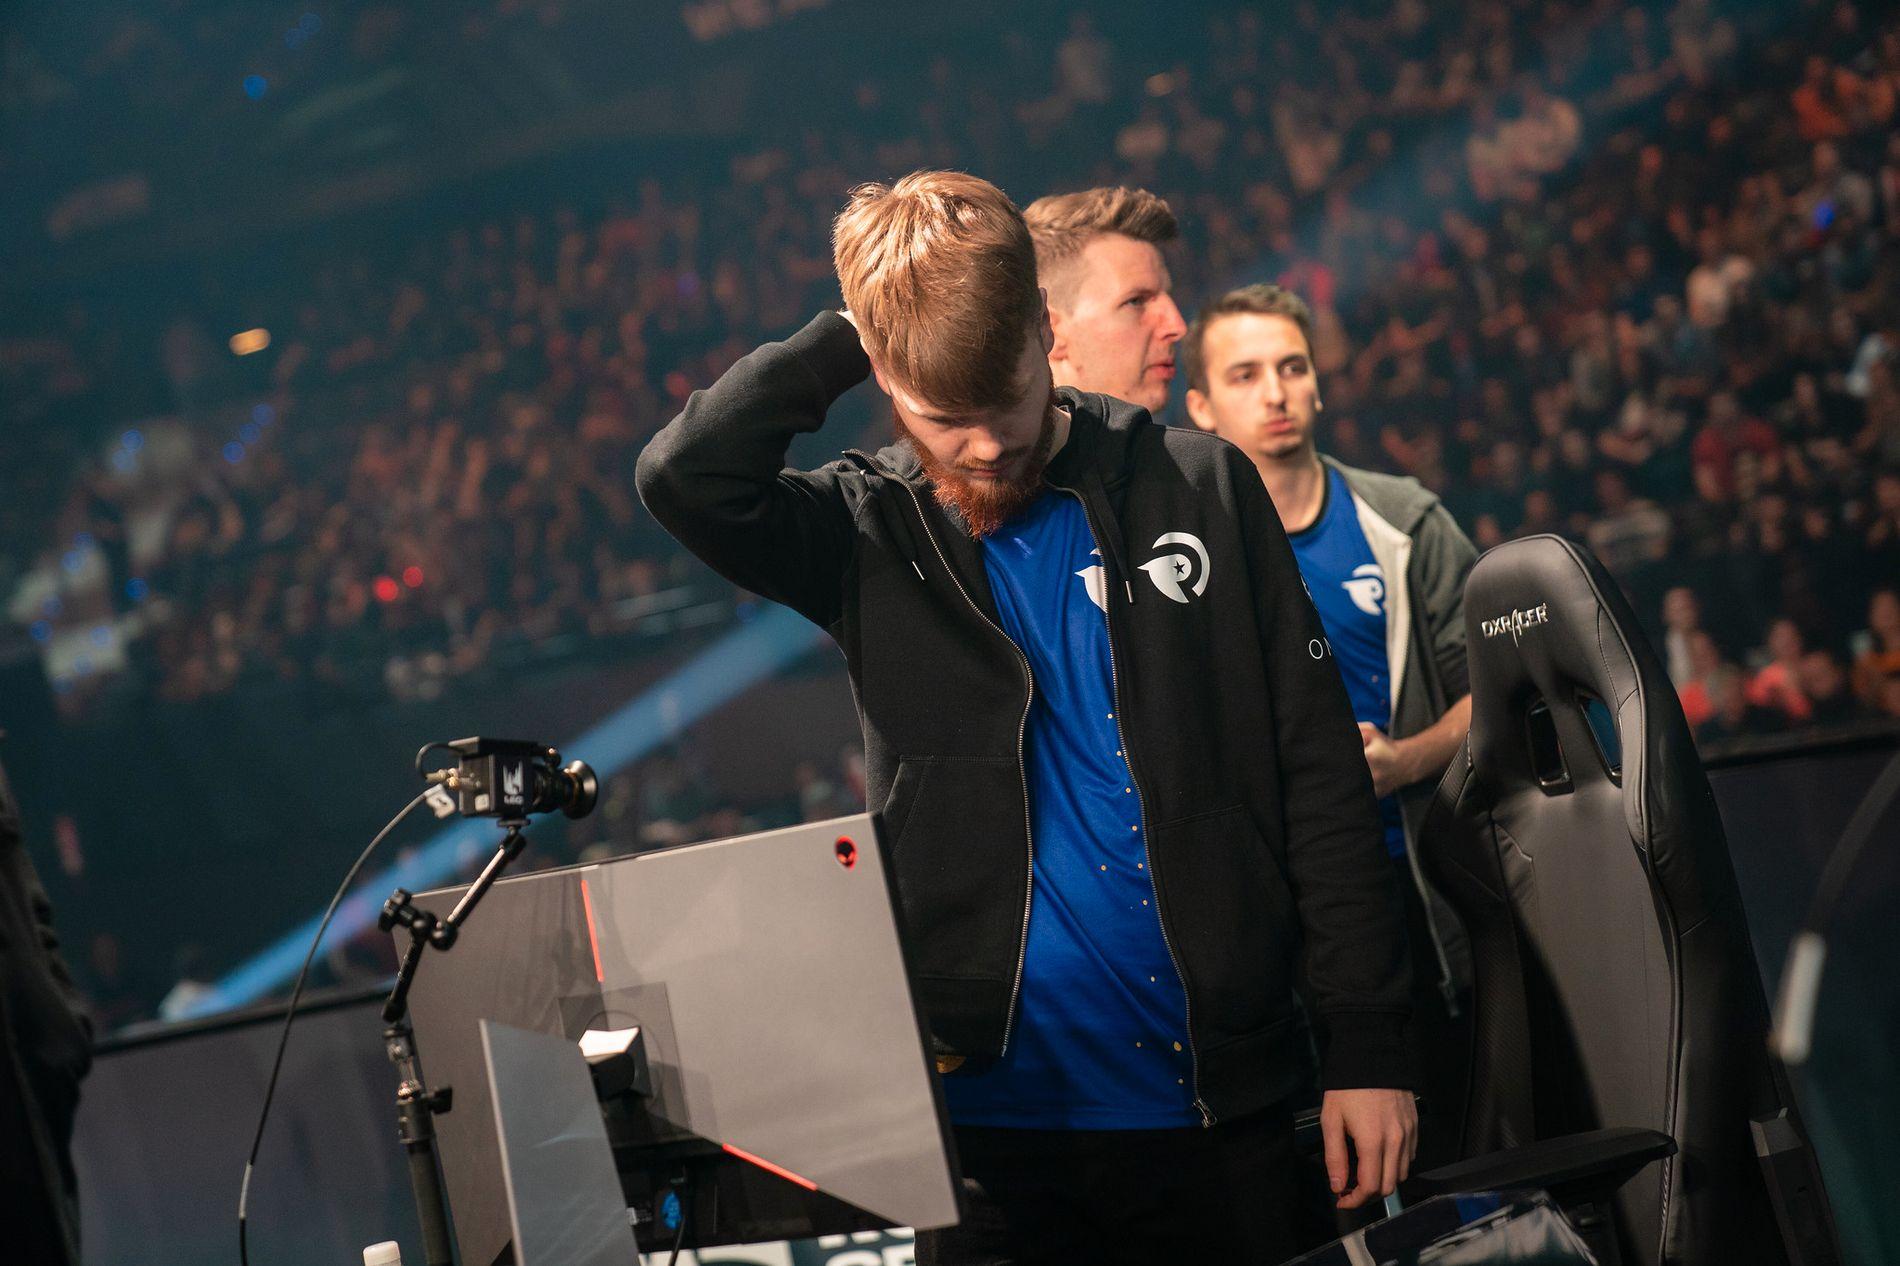 TØFT TAP: Erlend Våtevik Holm og Origen tapte 0–3 mot G2 eSports i Rotterdam, Nederland forrige helg.